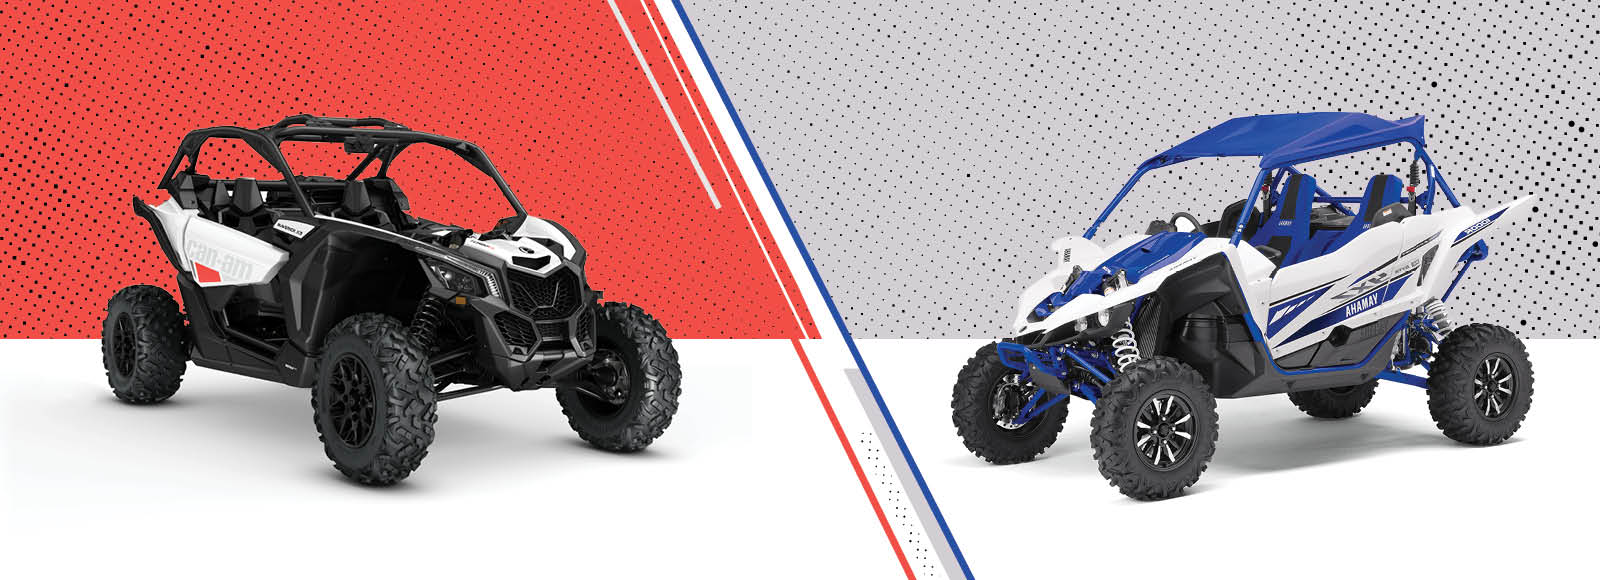 Side by Side UTV Review : CanAm Maverick X3 vs Yamaha YXZ1000R